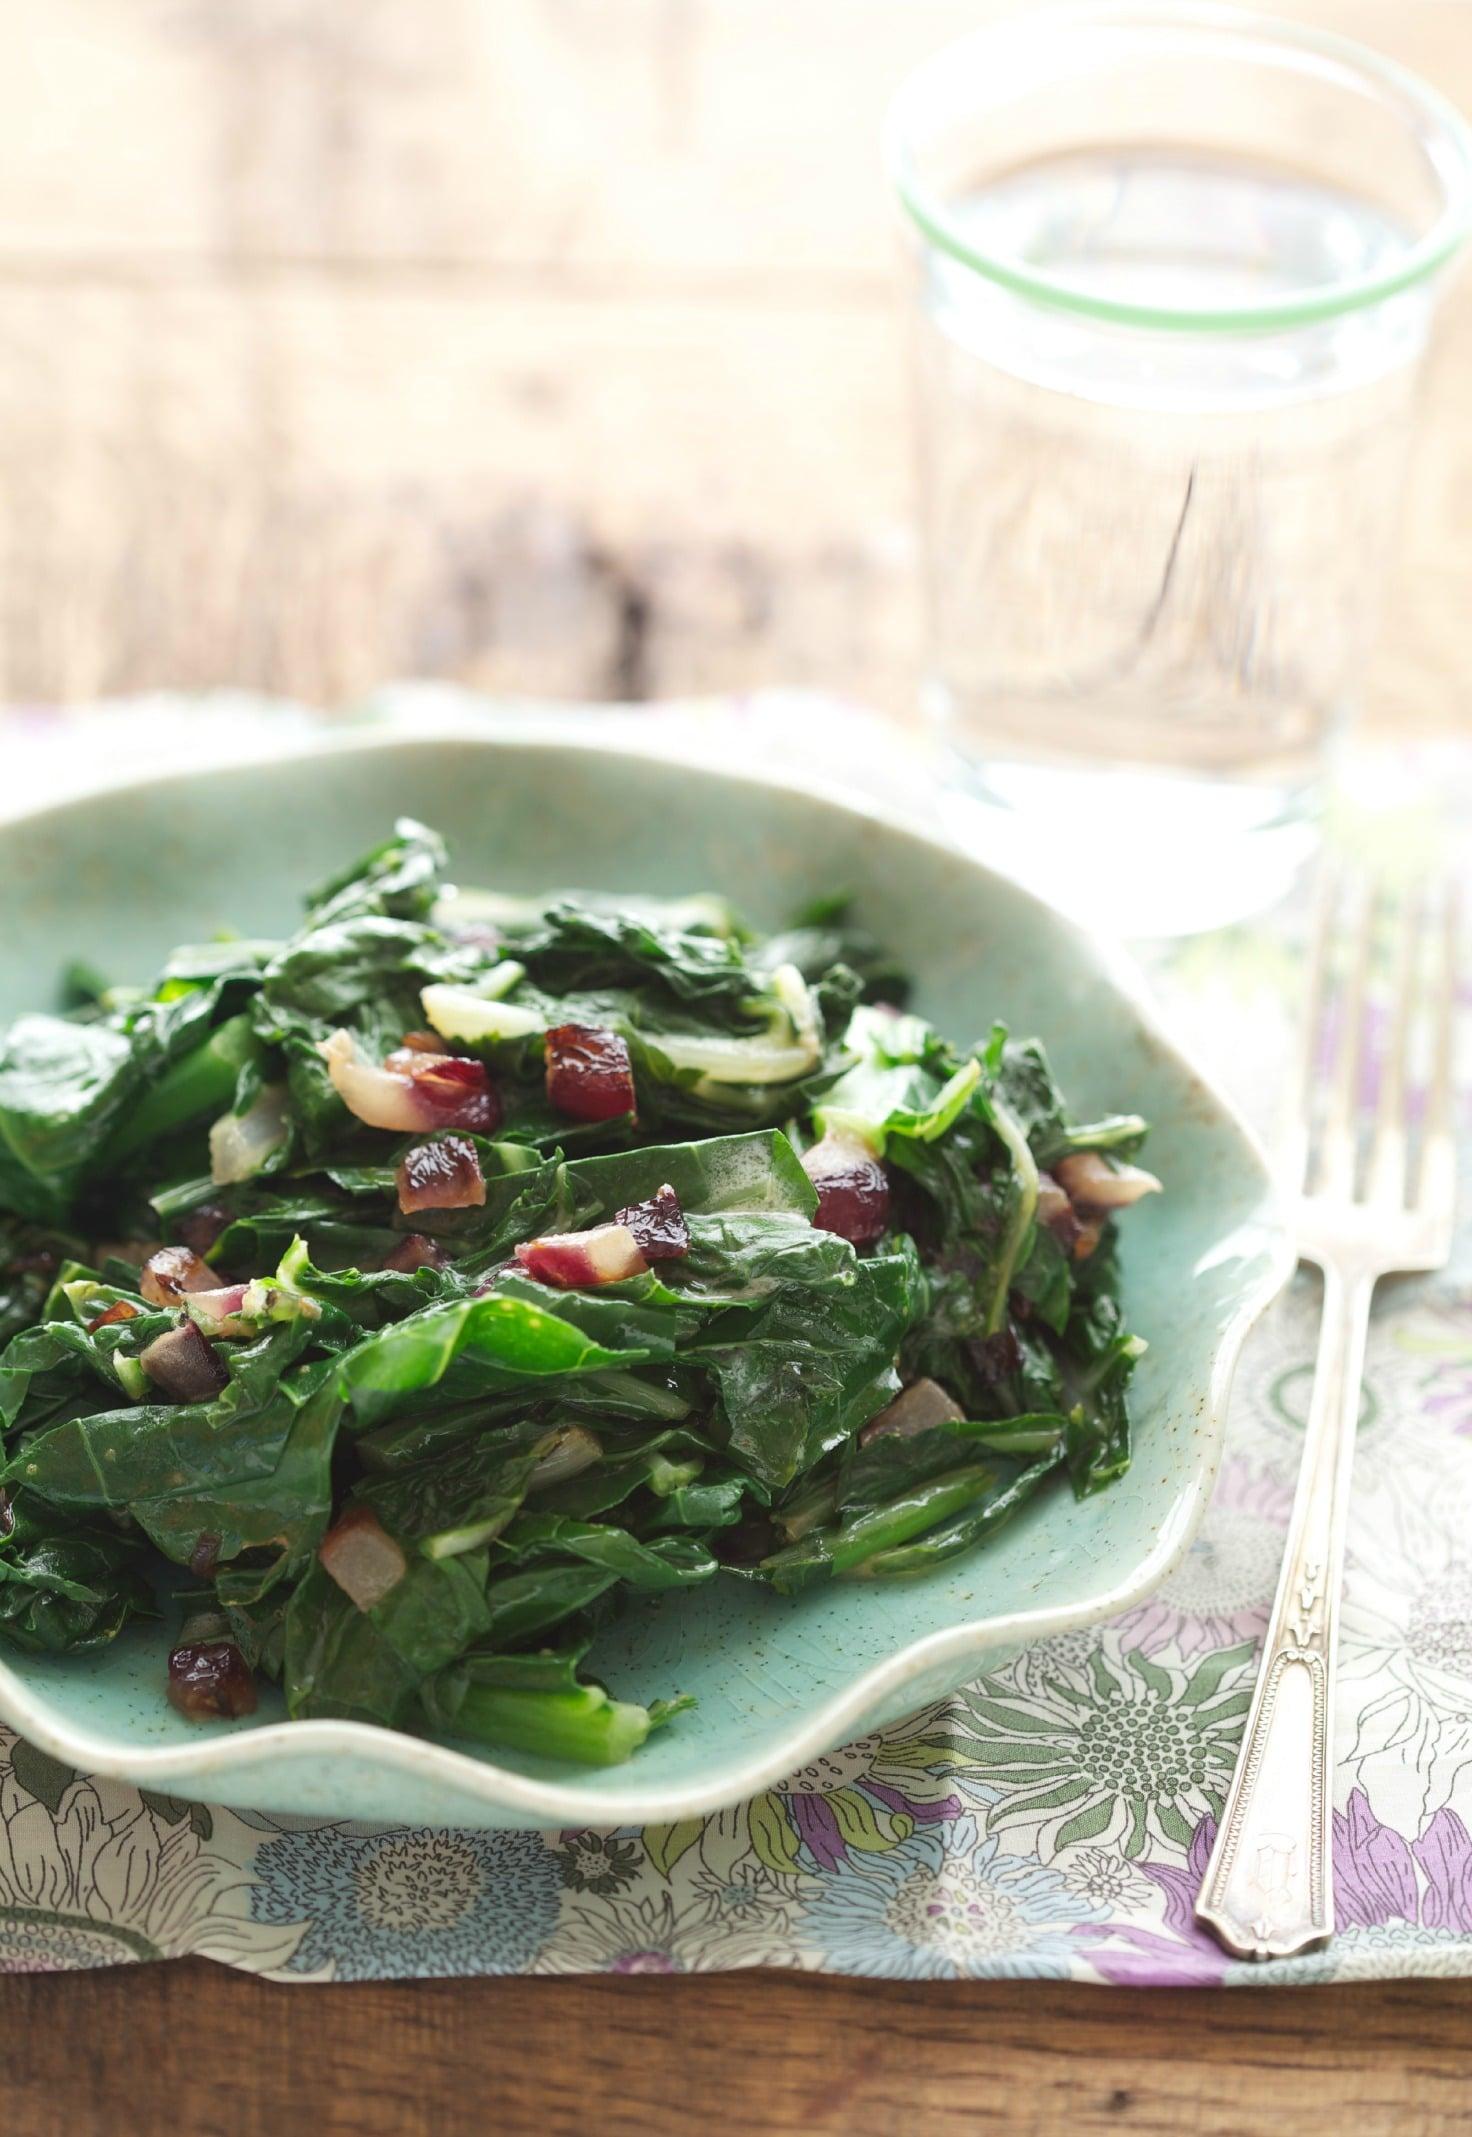 Sautéed Leafy Greens